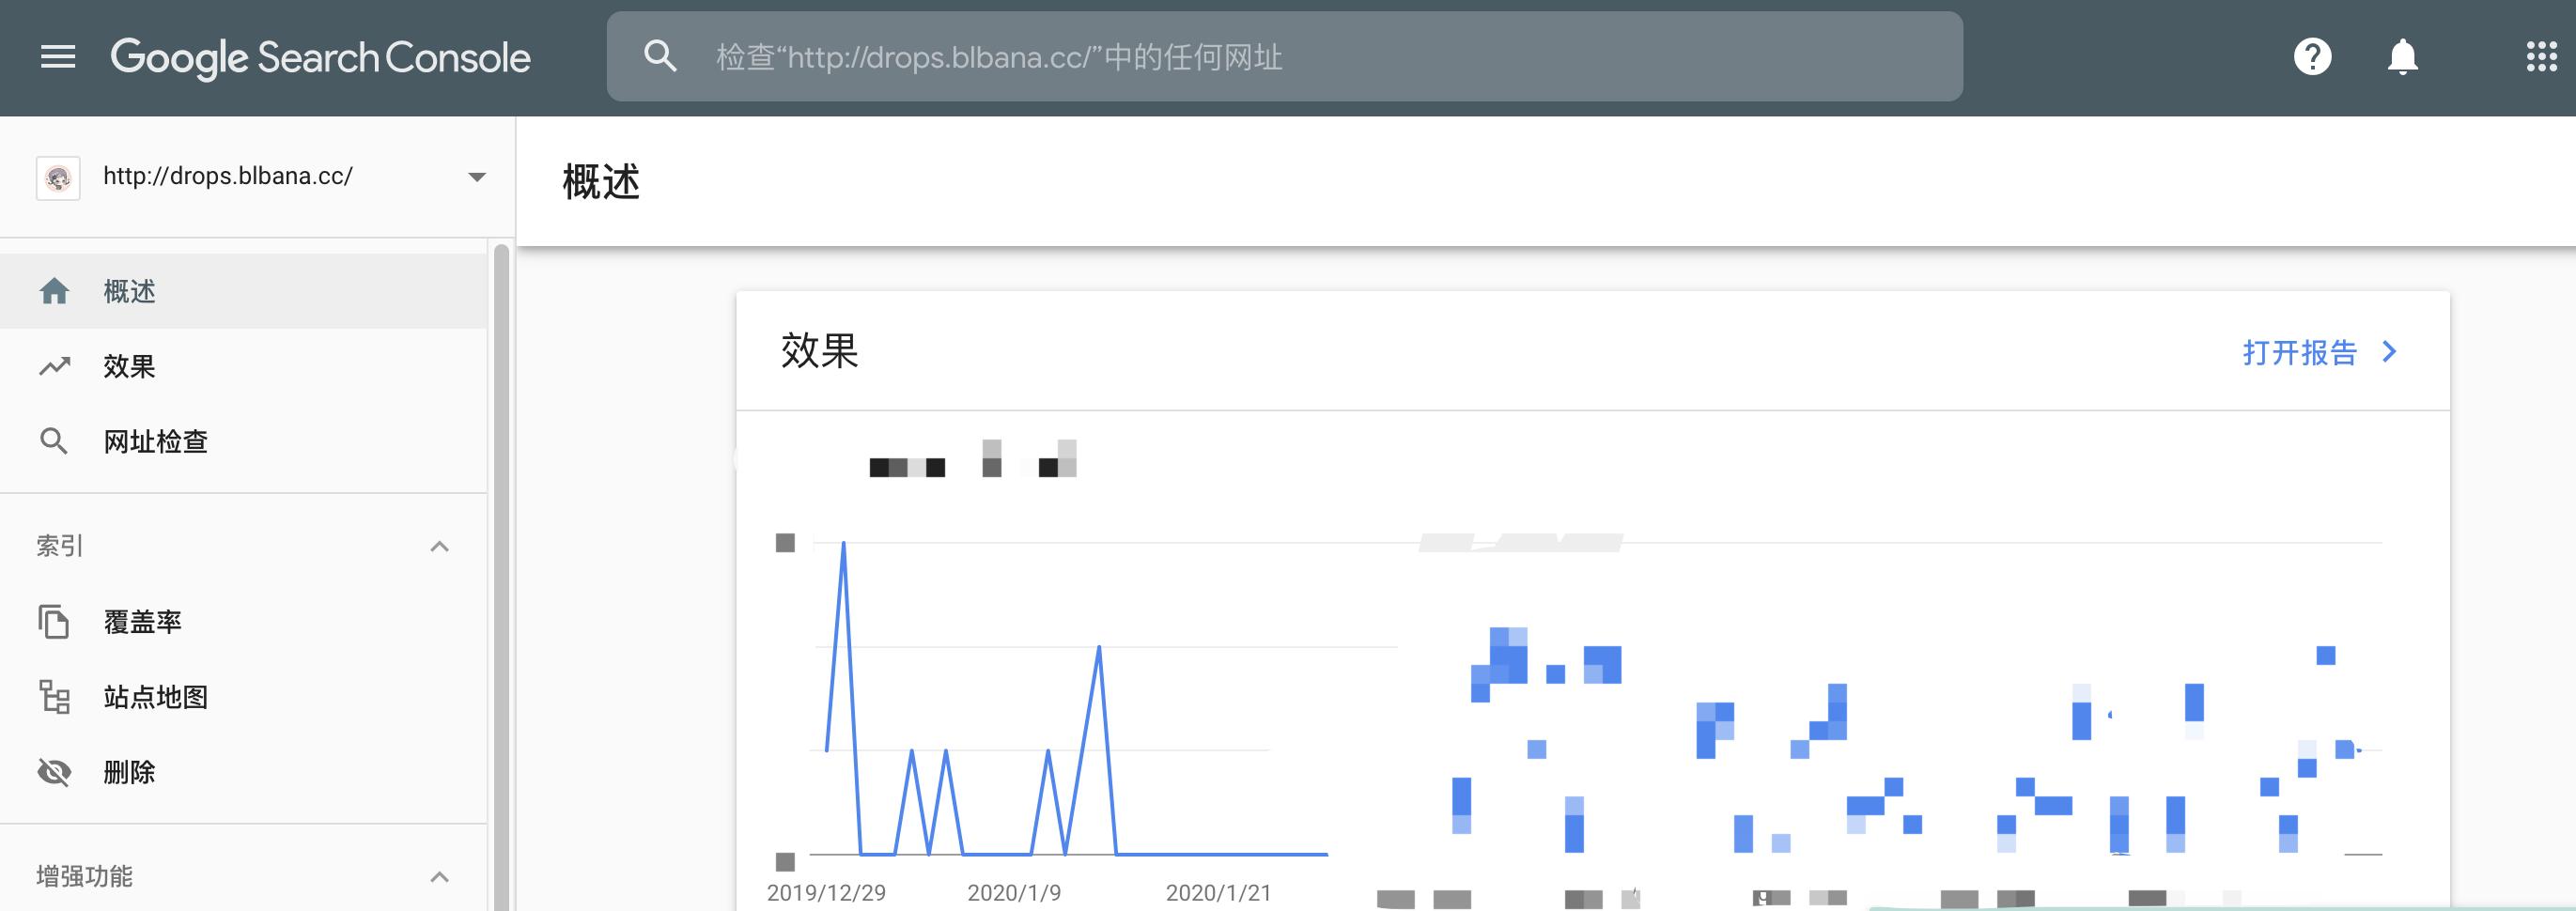 Hexo%20Google%20Analytics/Untitled%202.png